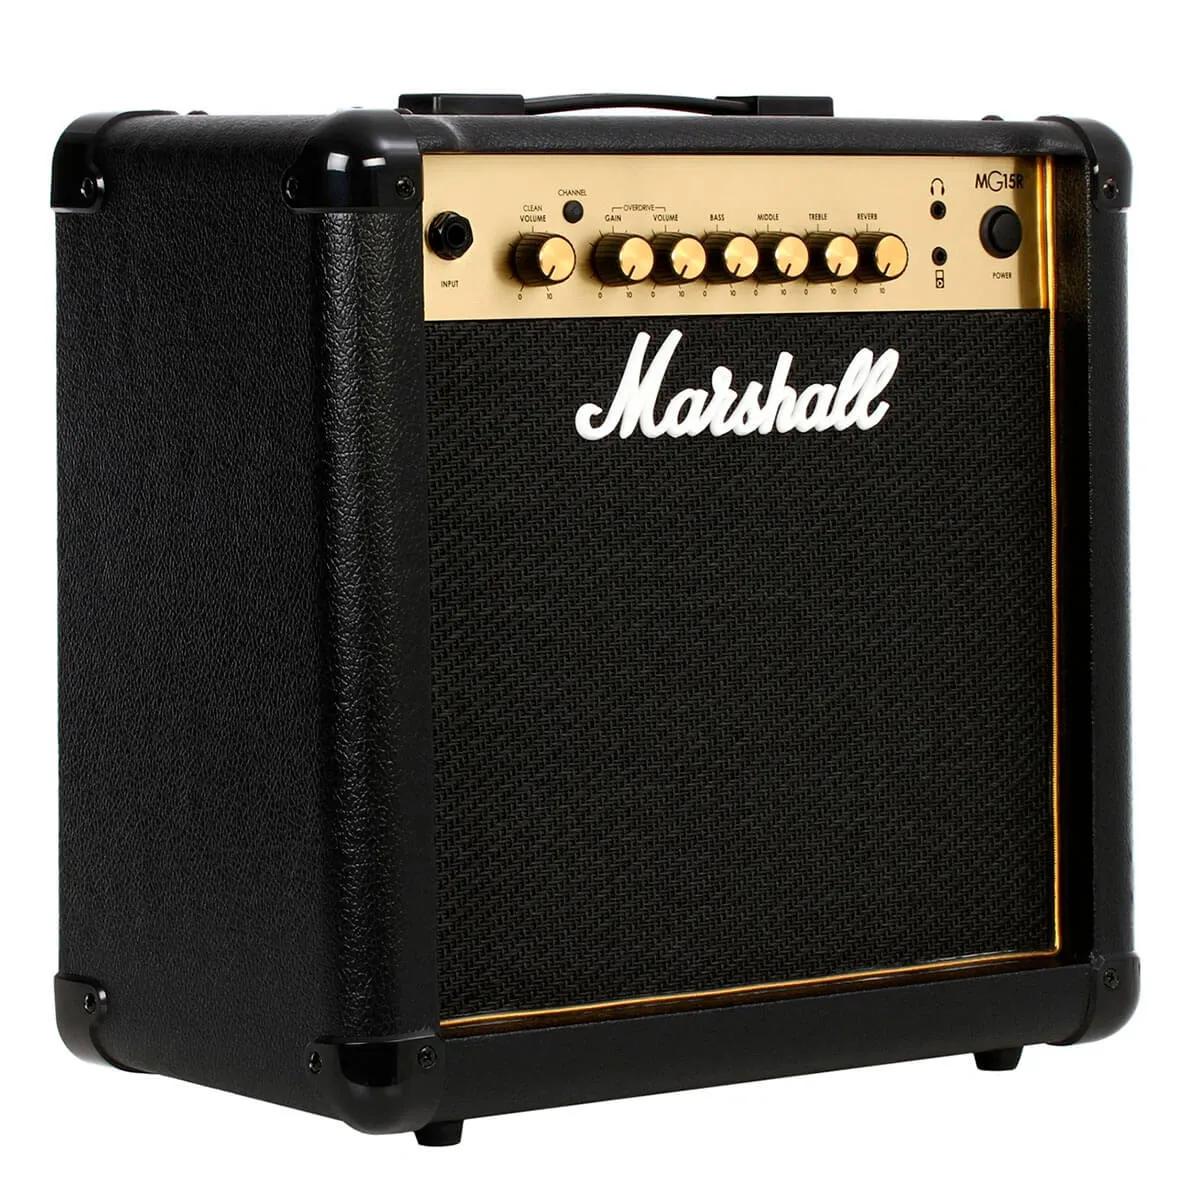 Caixa Amplifica Marshall MG15R Gold 15W 1x8 para Guitarra